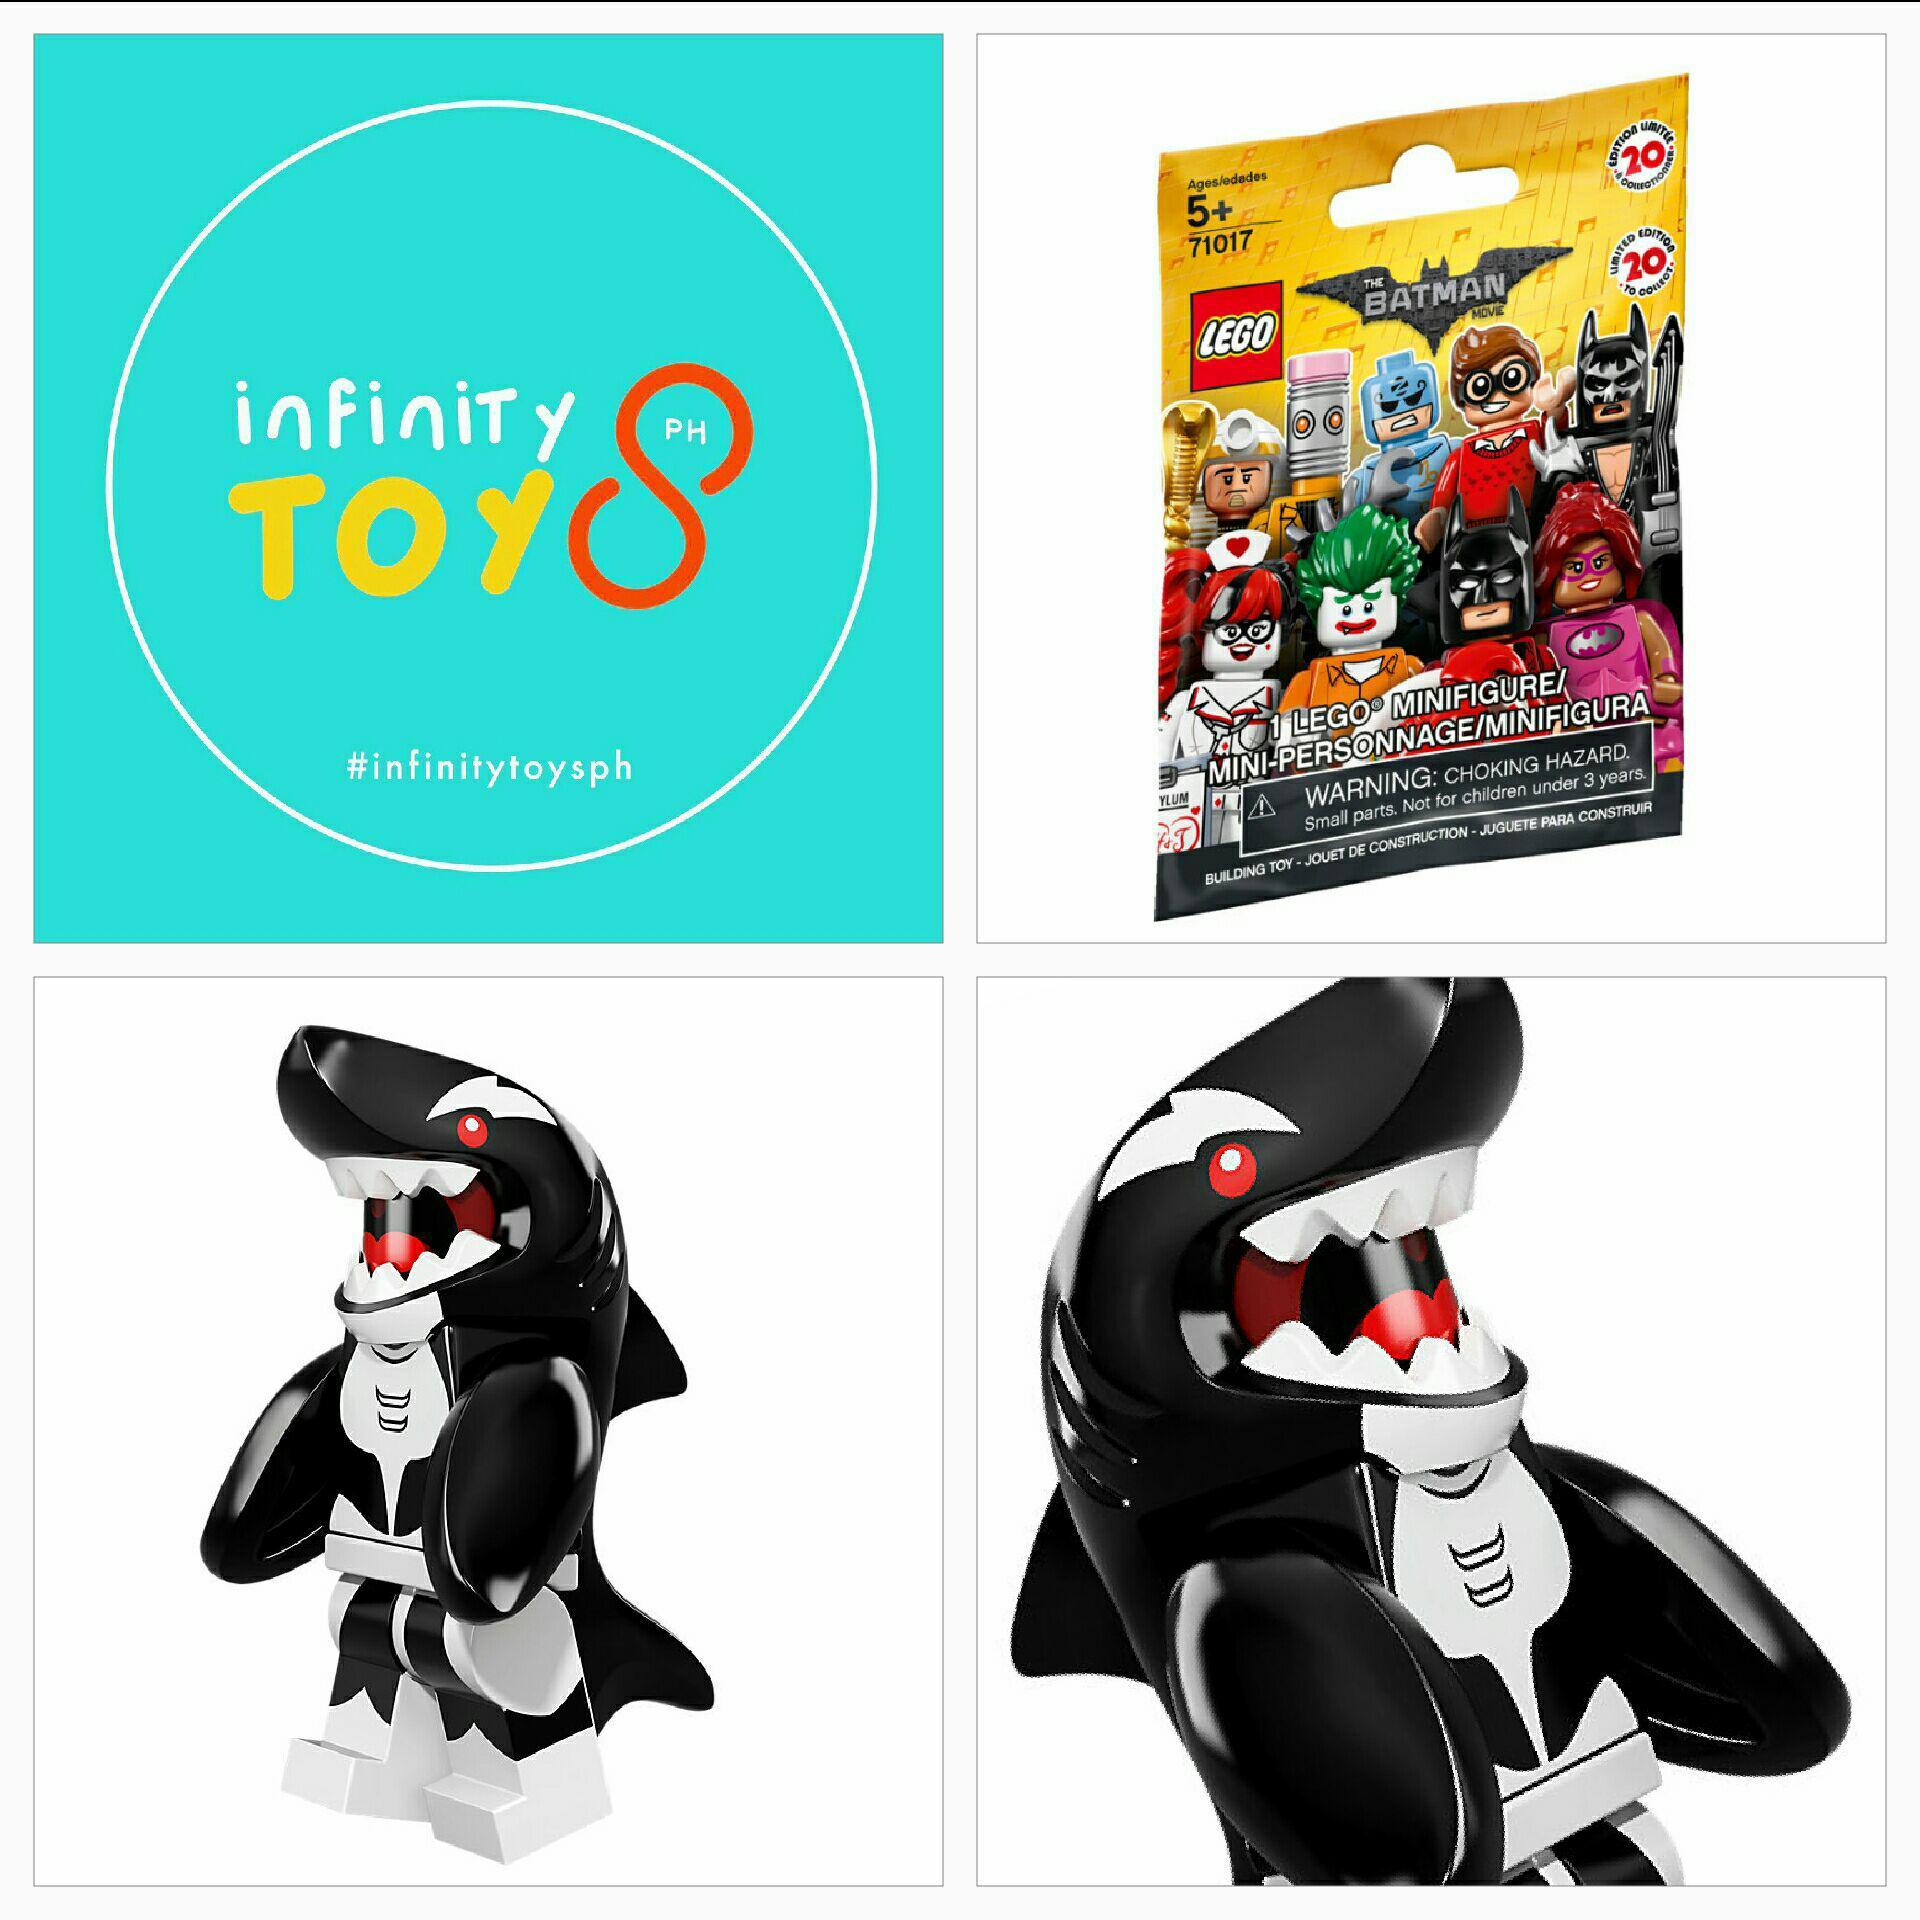 Lego Philippines Mini Action Figures For Sale Prices 71017 Minifigures Batman Movie Series Box Of 60 Orca